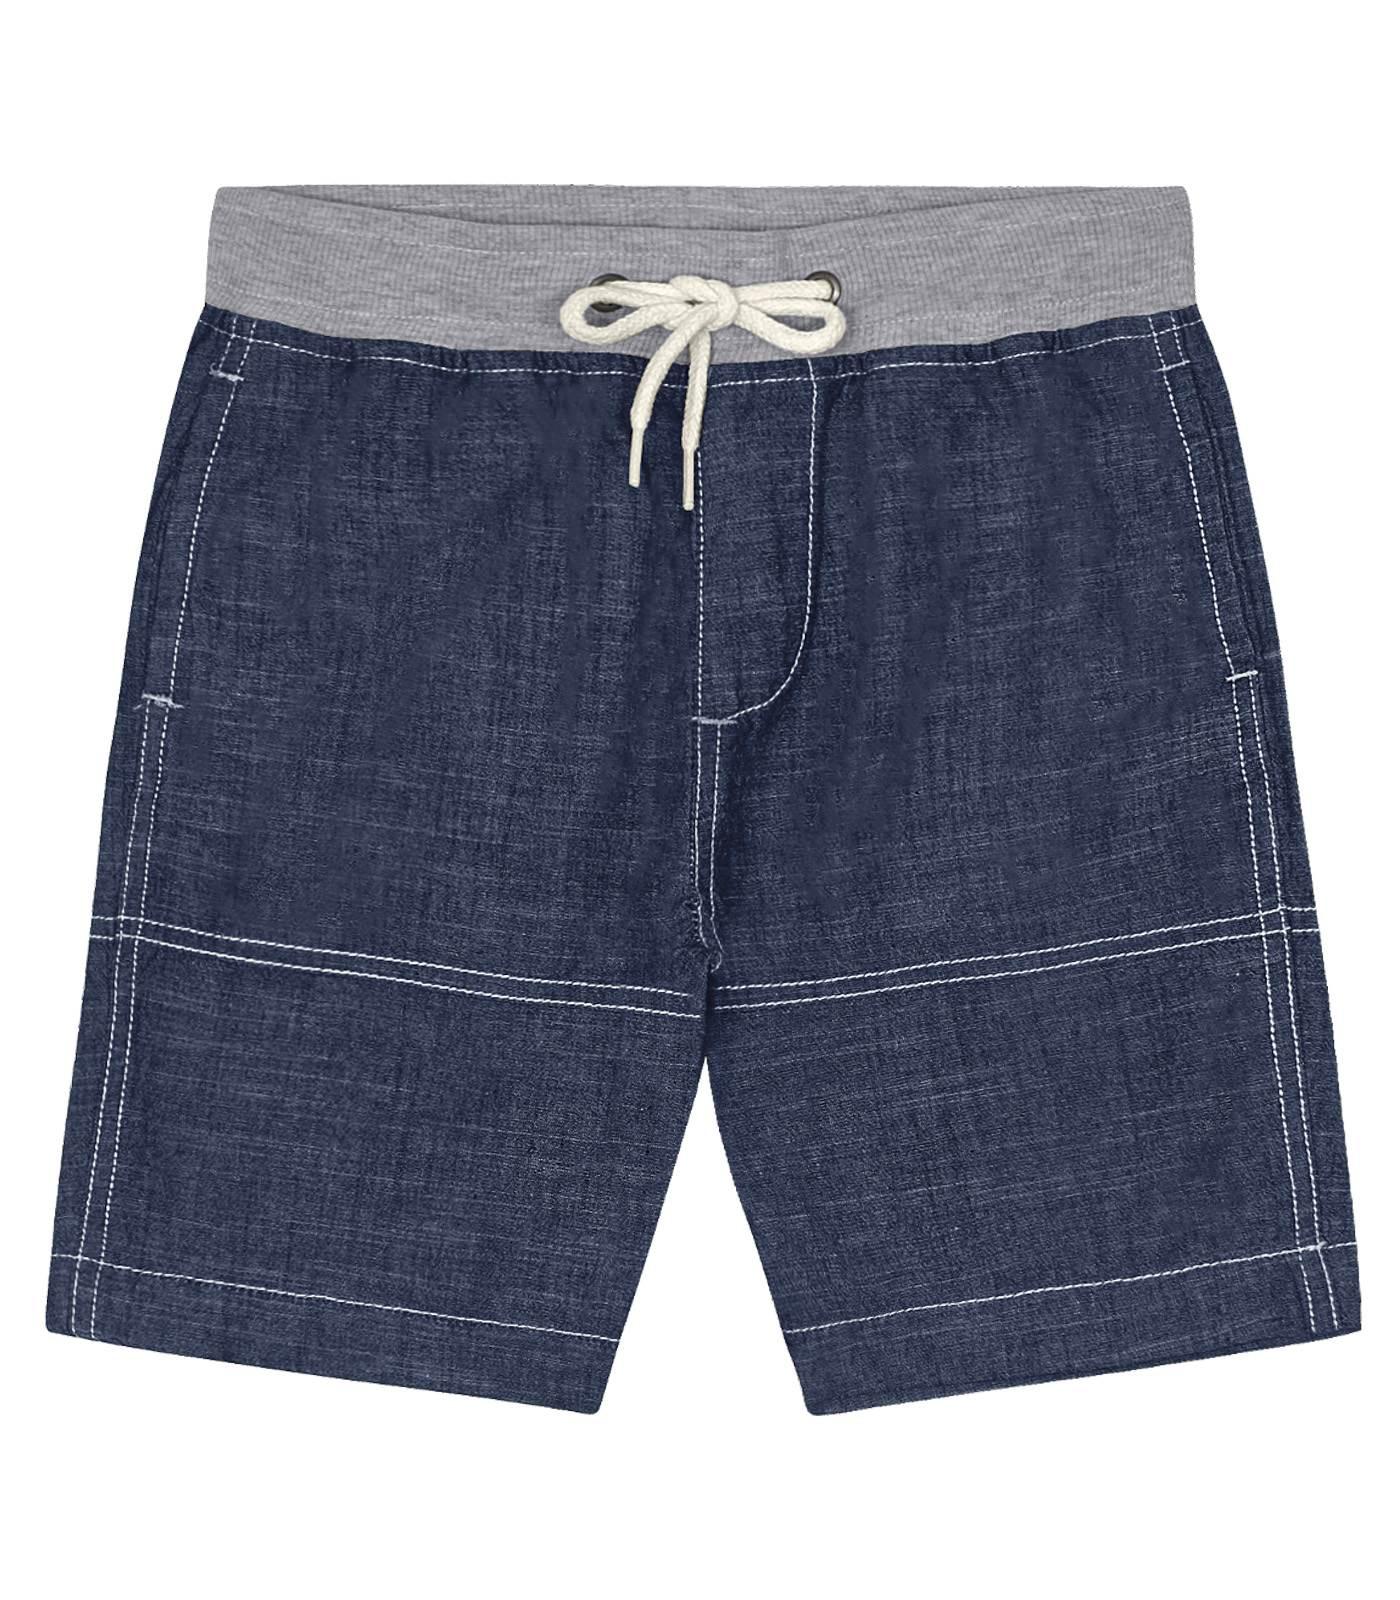 Bermuda Chambrey Trick Nick Jeans